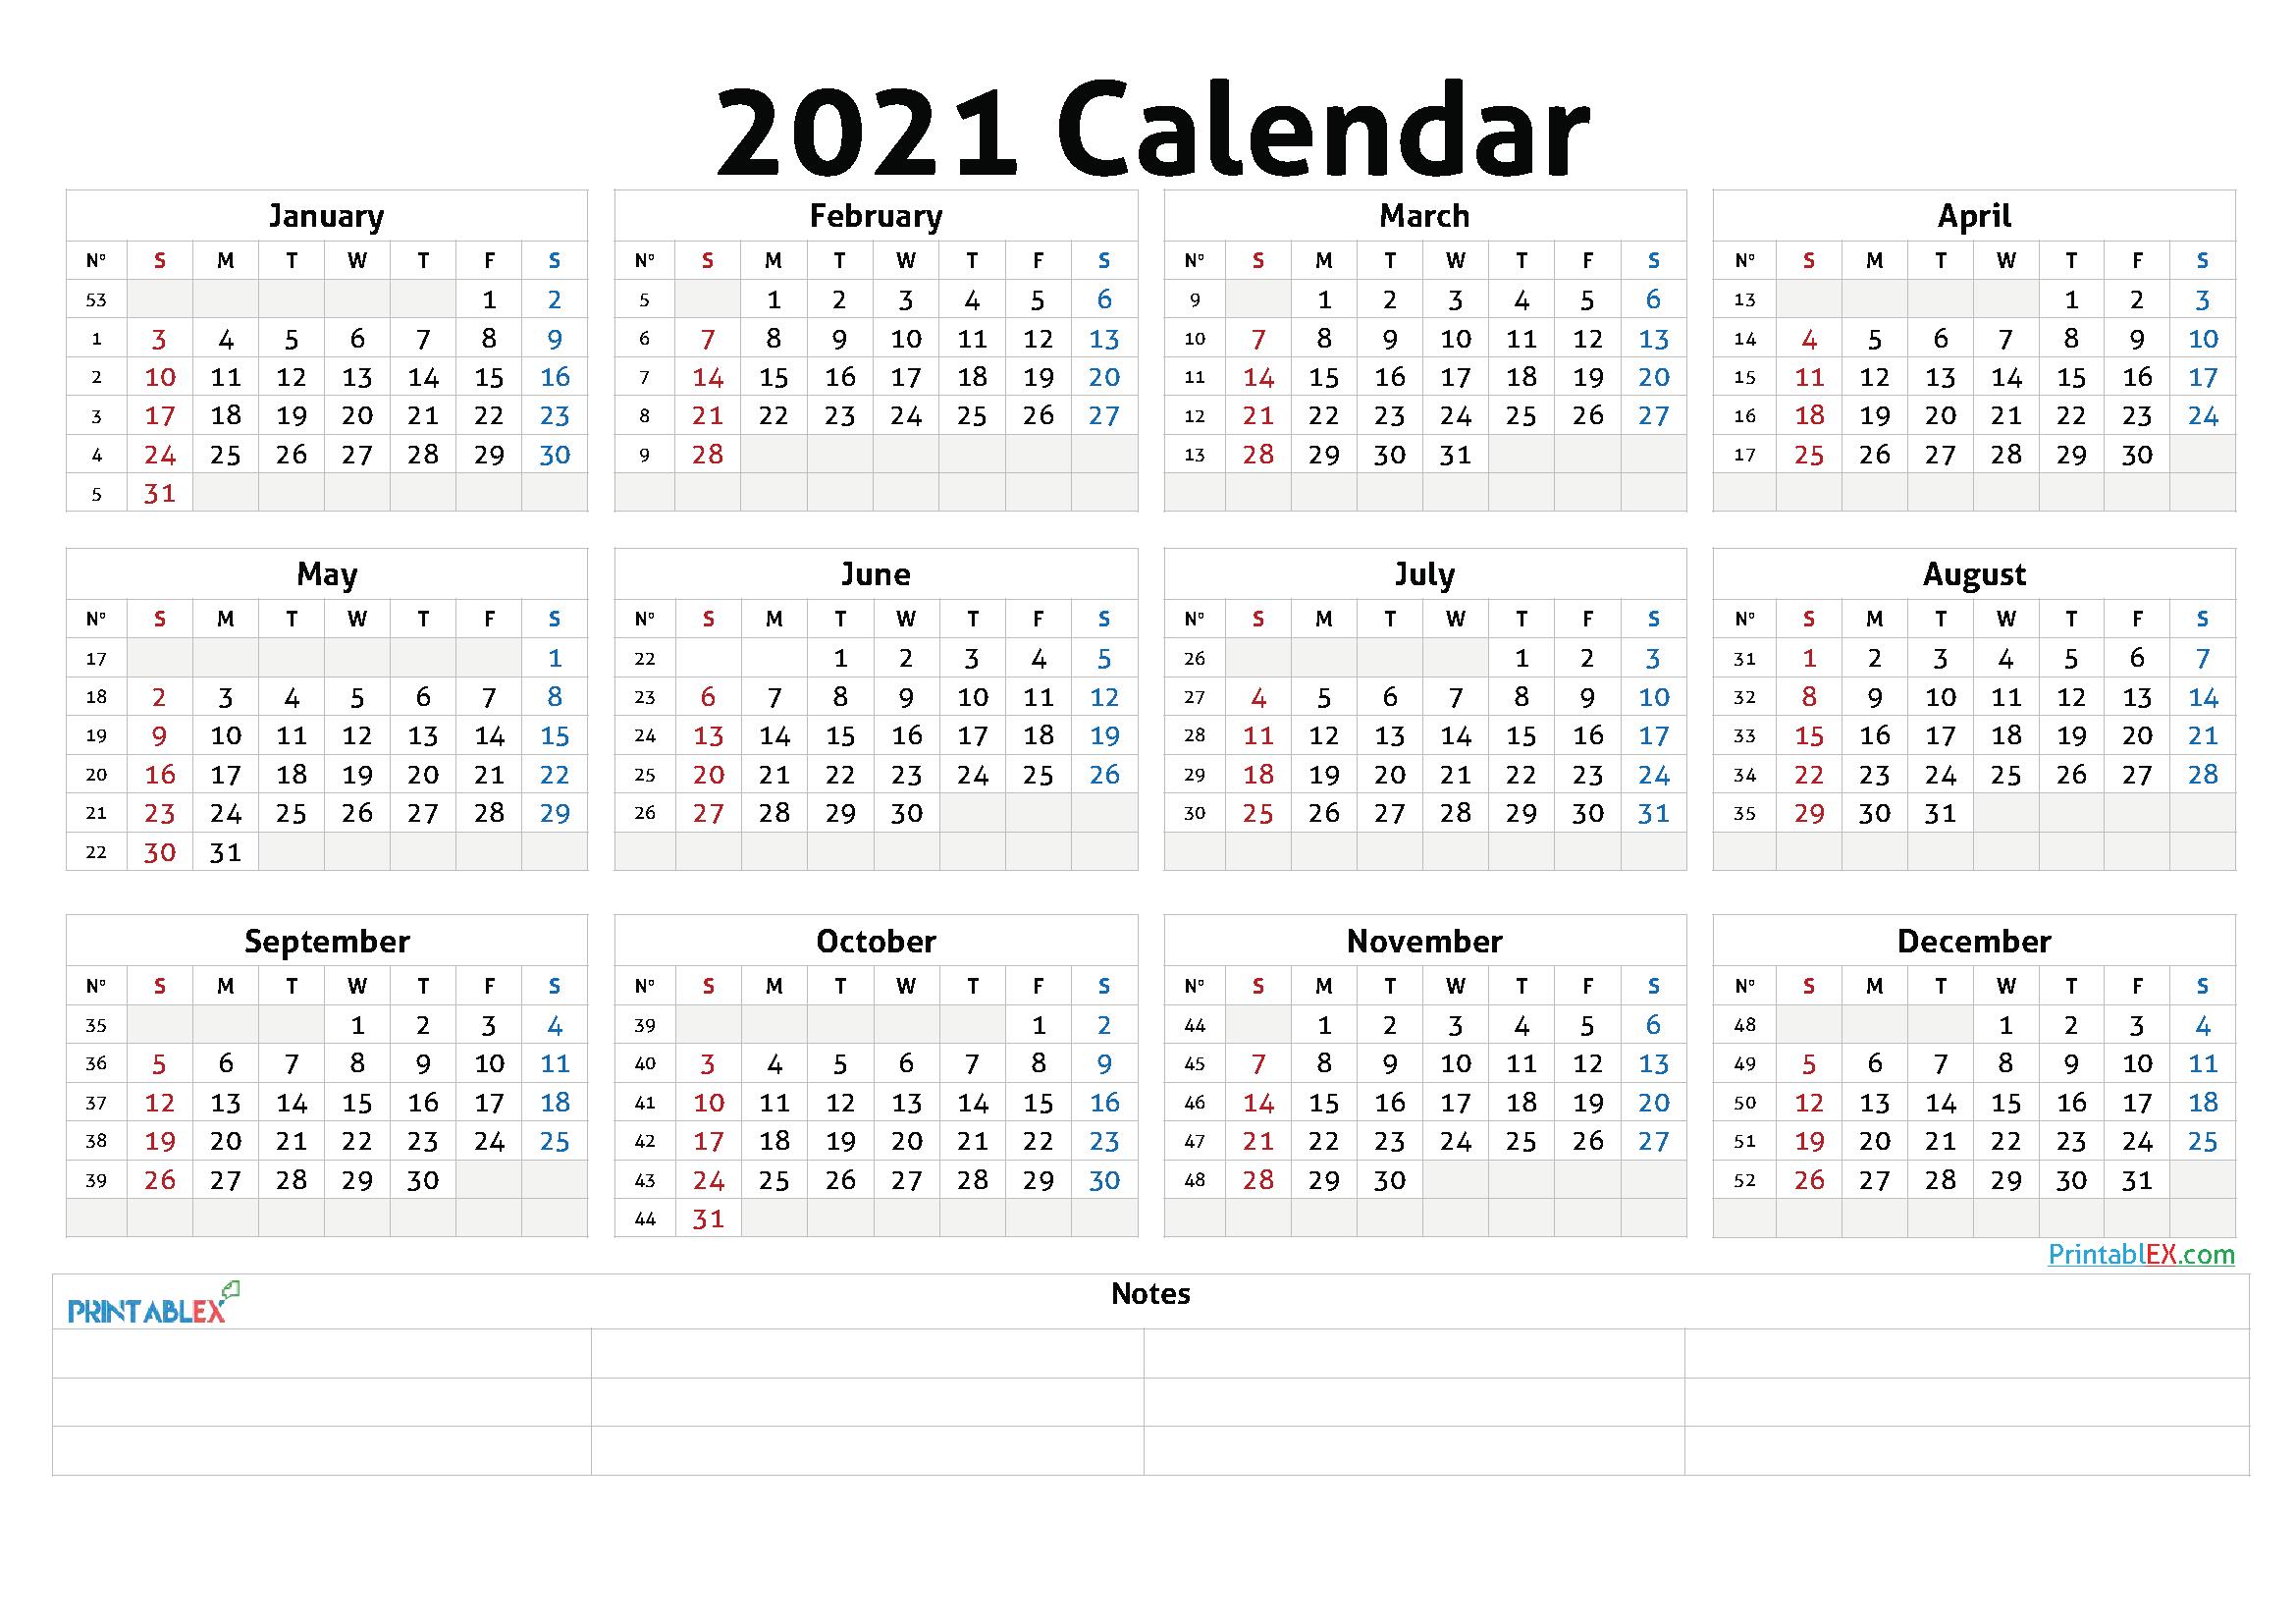 2021 Annual Calendar Printable - 21Ytw47  2021 Yearly Calendar Printable Free With Notes